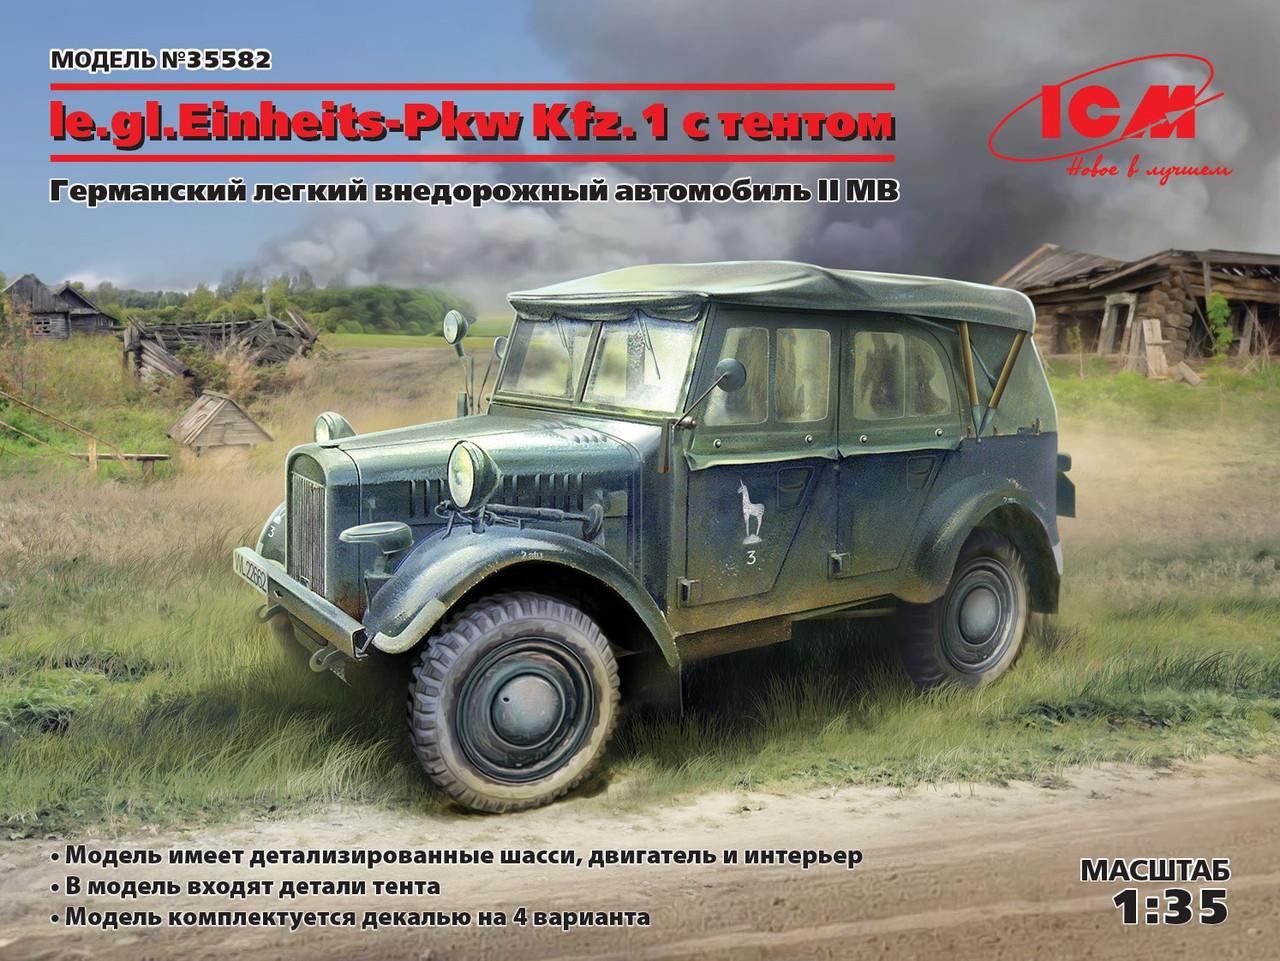 Немецкий легкий внедорожный автомобиль le.gl.Einheitz-Pkw Kfz.1 с тентом, ІІ МВ. 1/35 ICM 35582